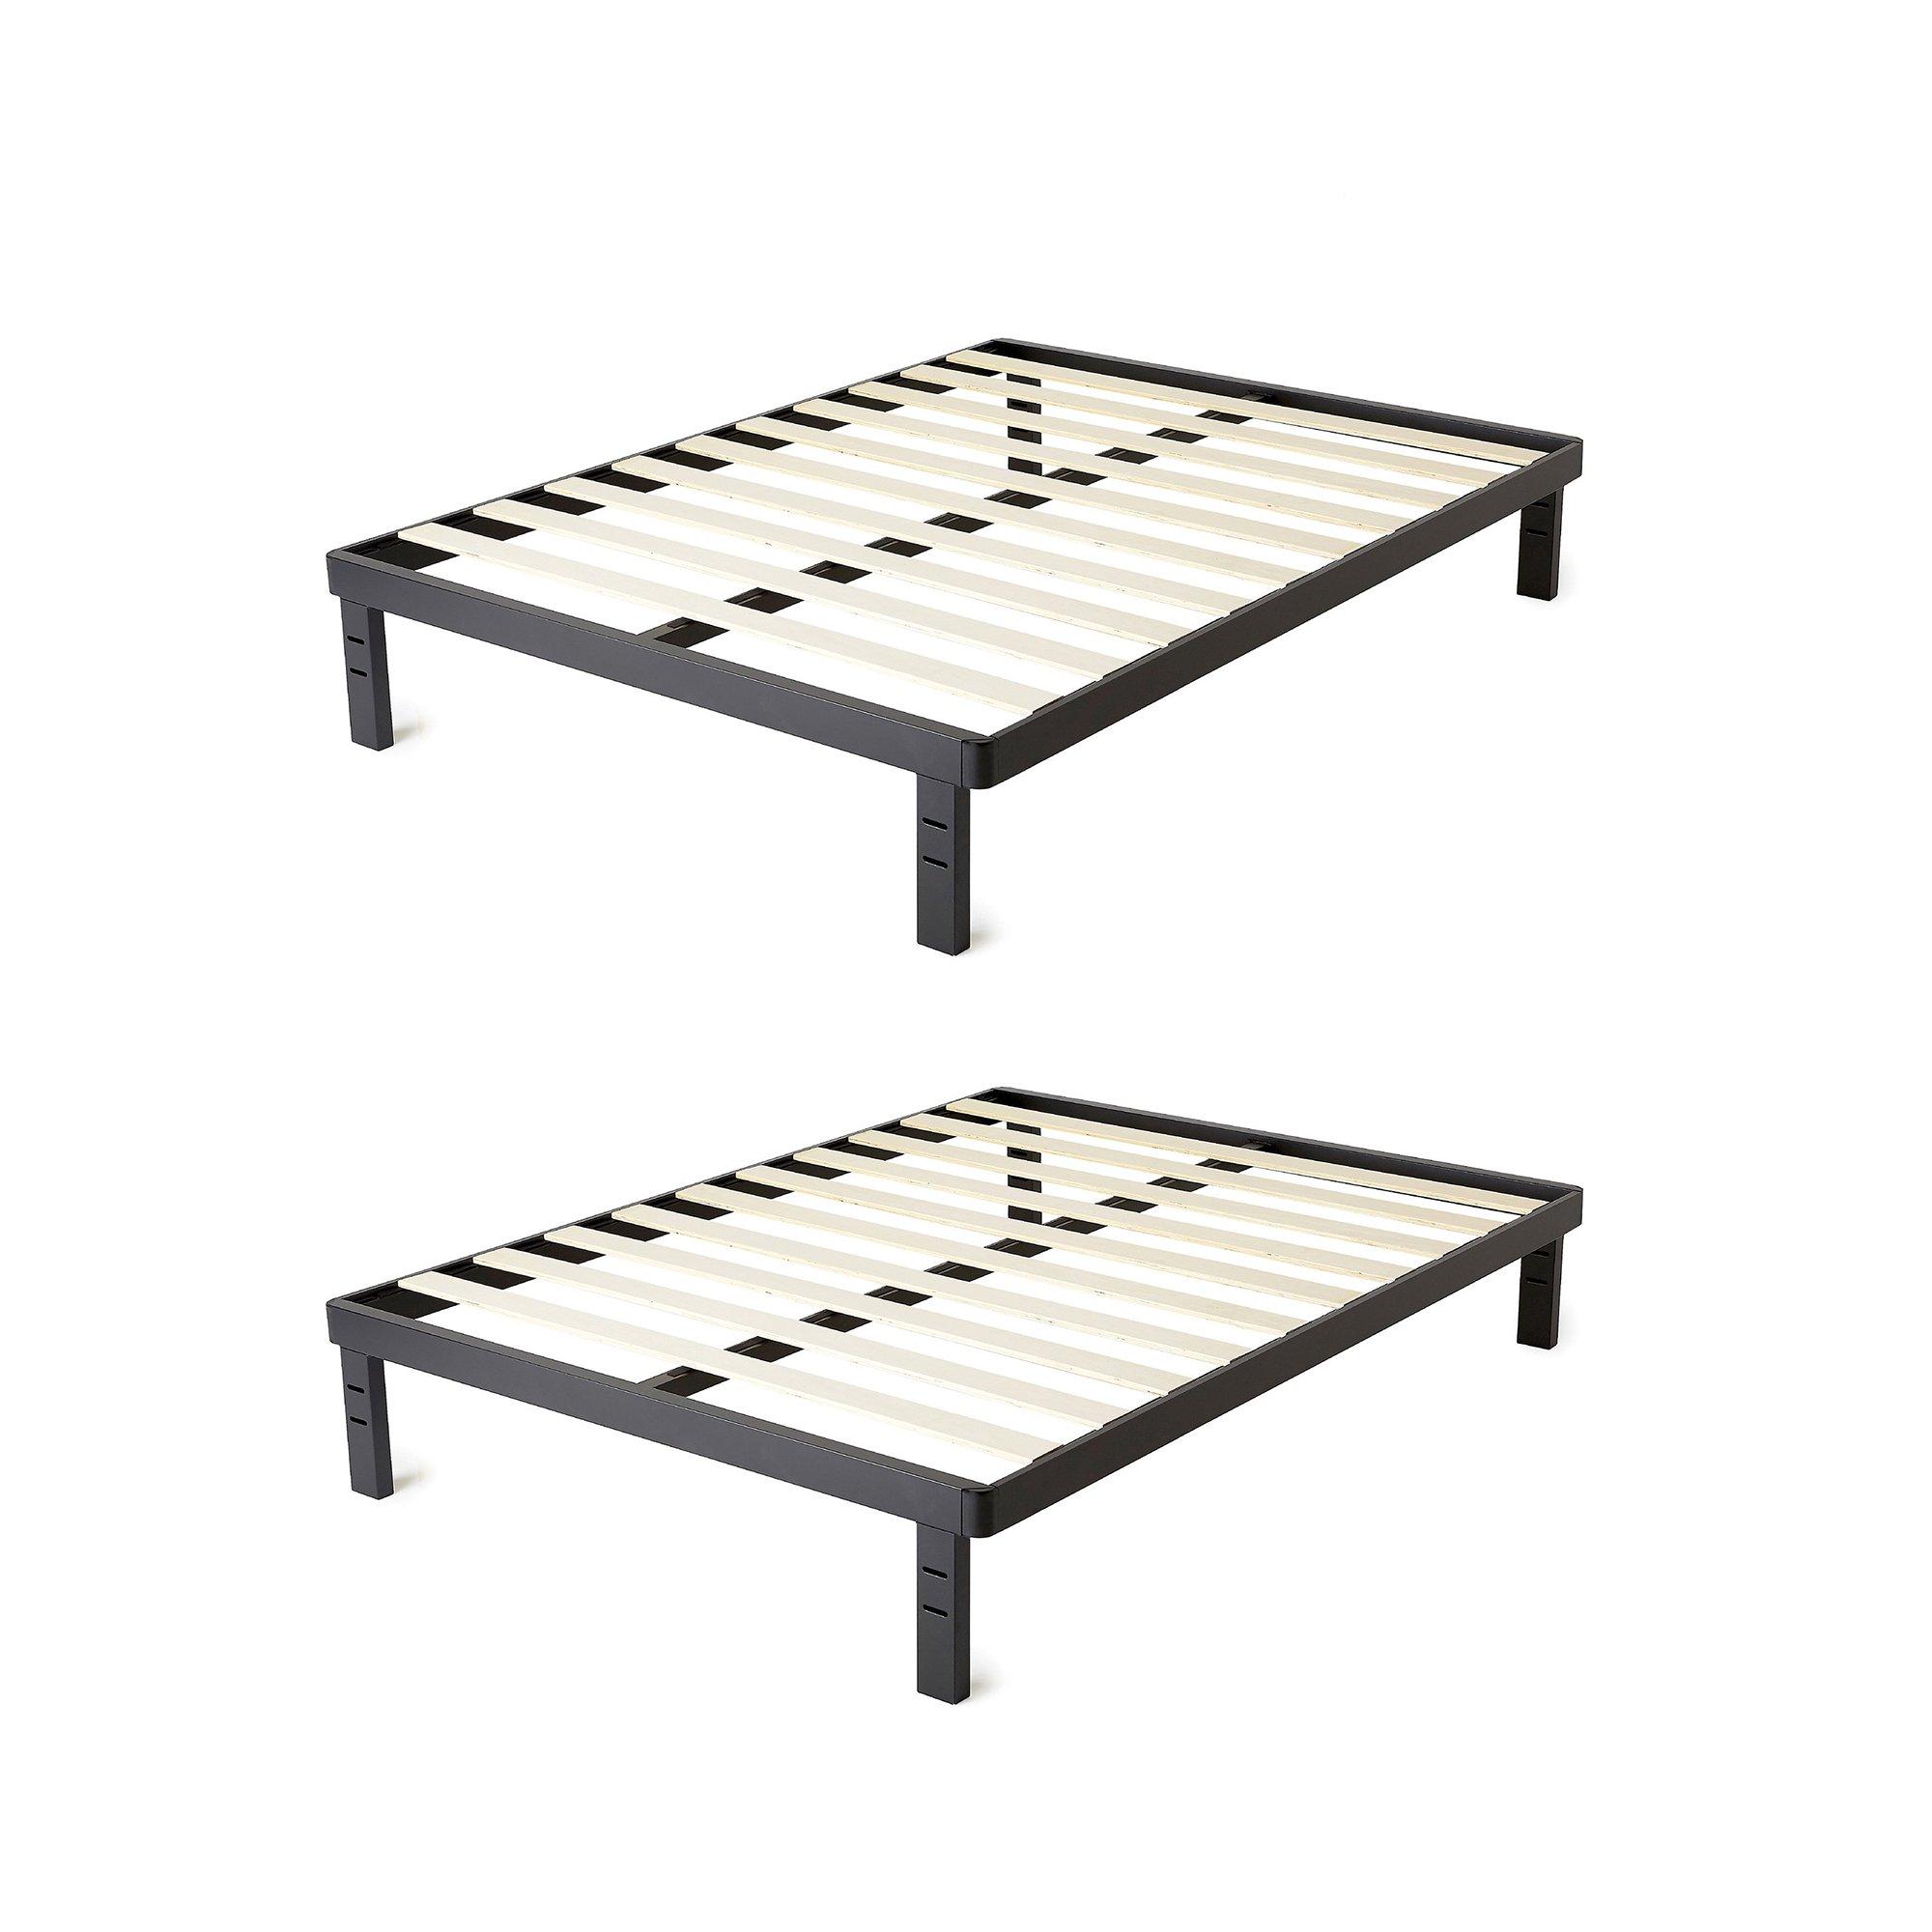 intelliBASE Deluxe Black Metal Platform Bed Frame w/ Wooden Slats, Twin (2 Pack)